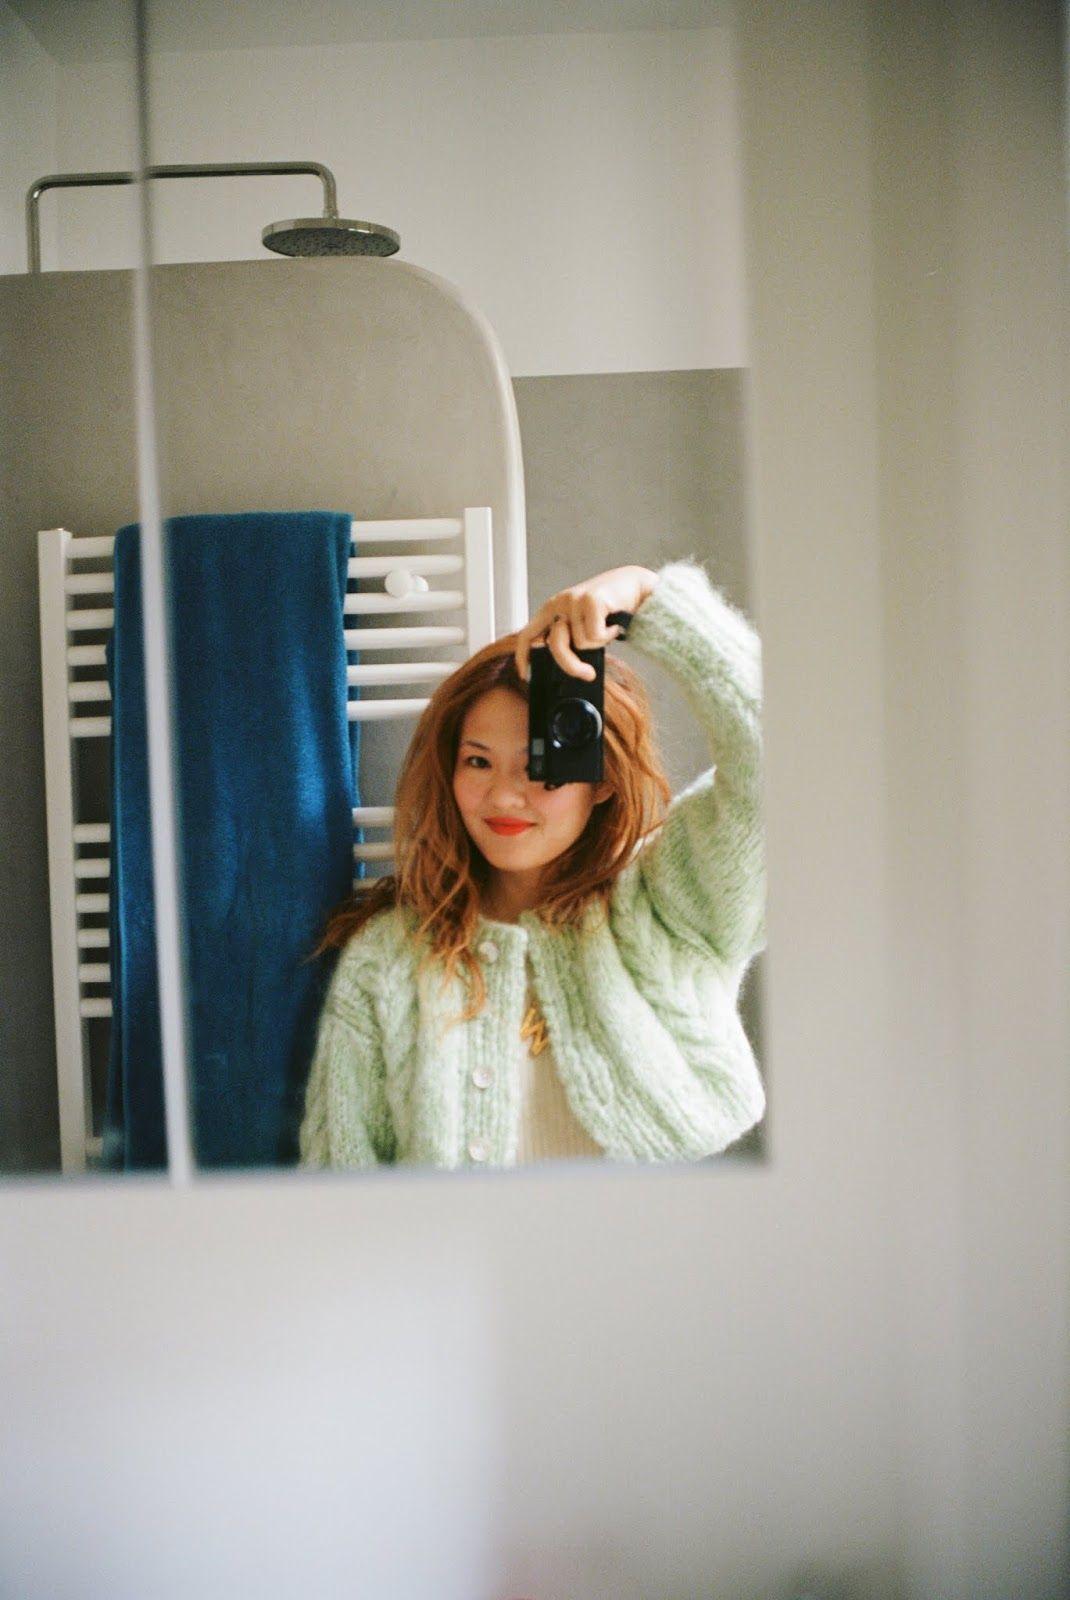 How To Take Mirror Selfies Tips For Taking Good Mirror Selfies